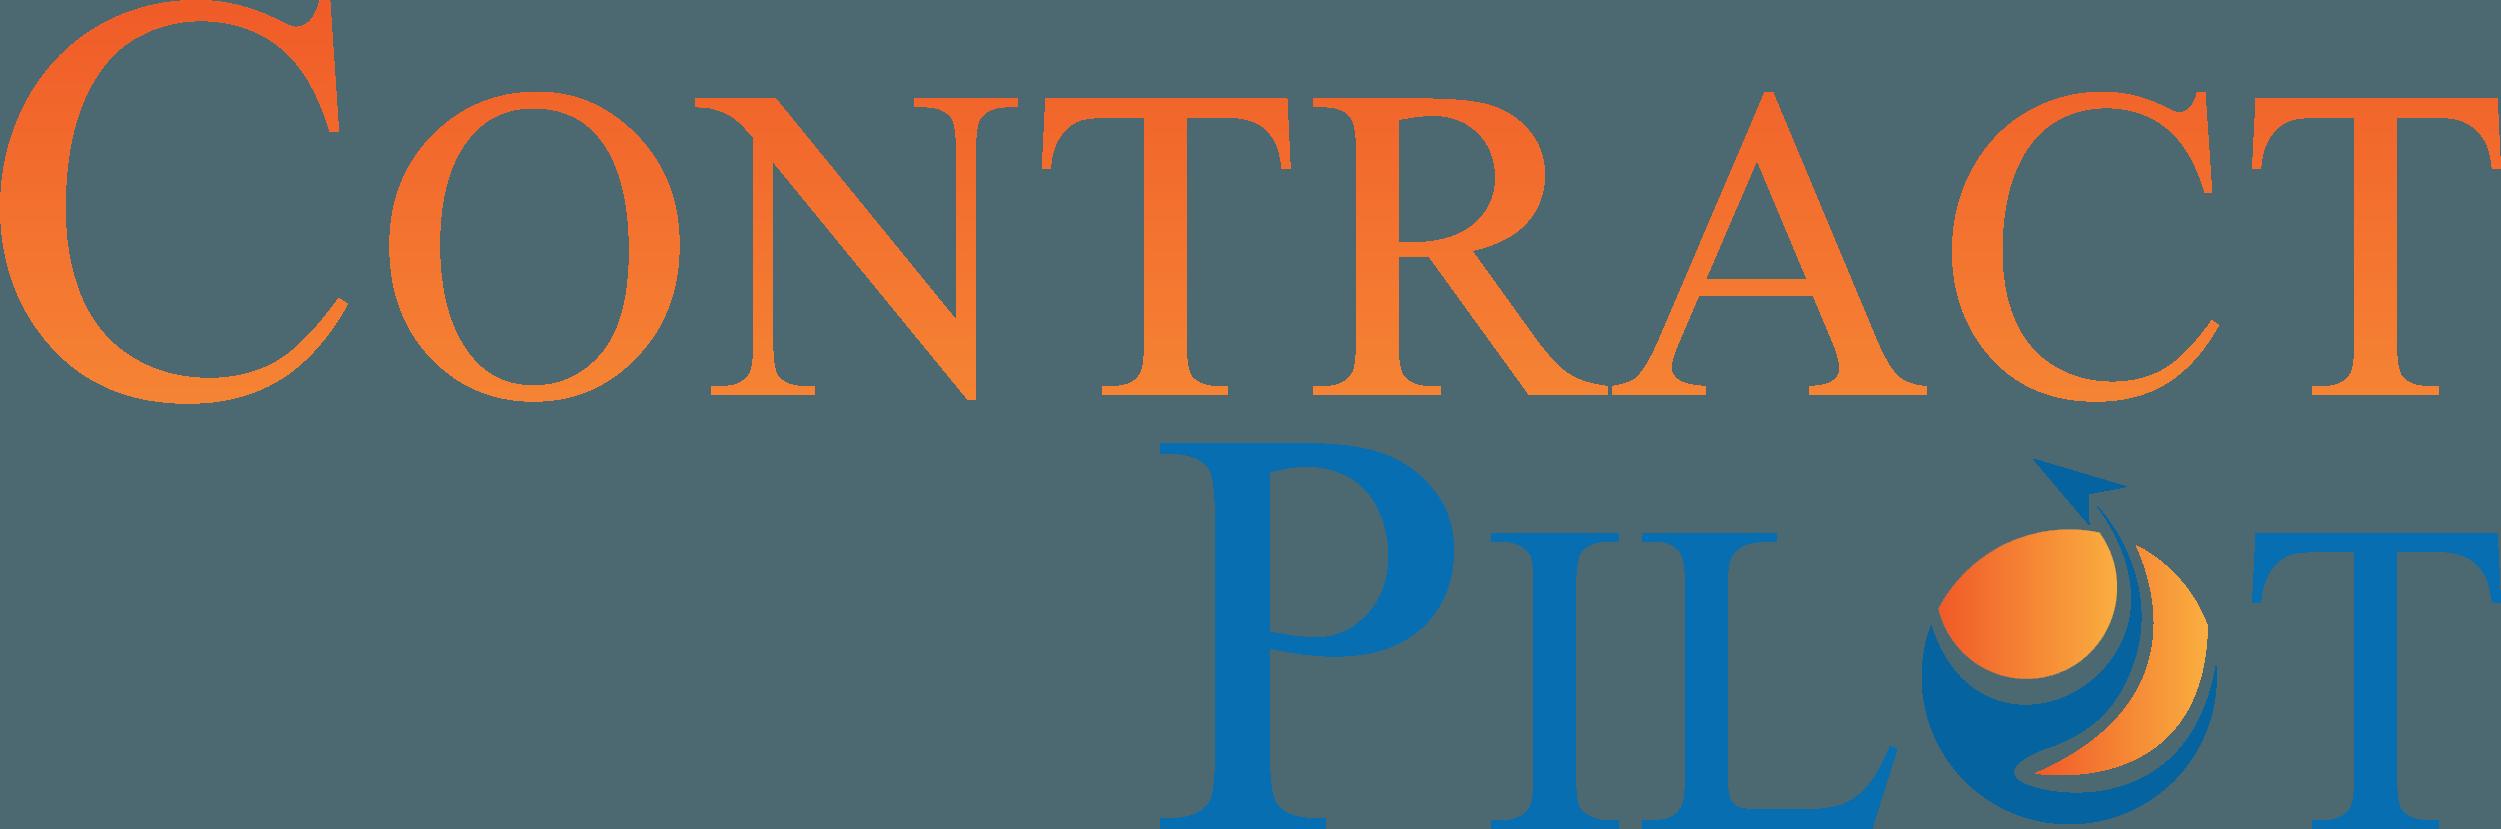 Contract Pilot's Association™